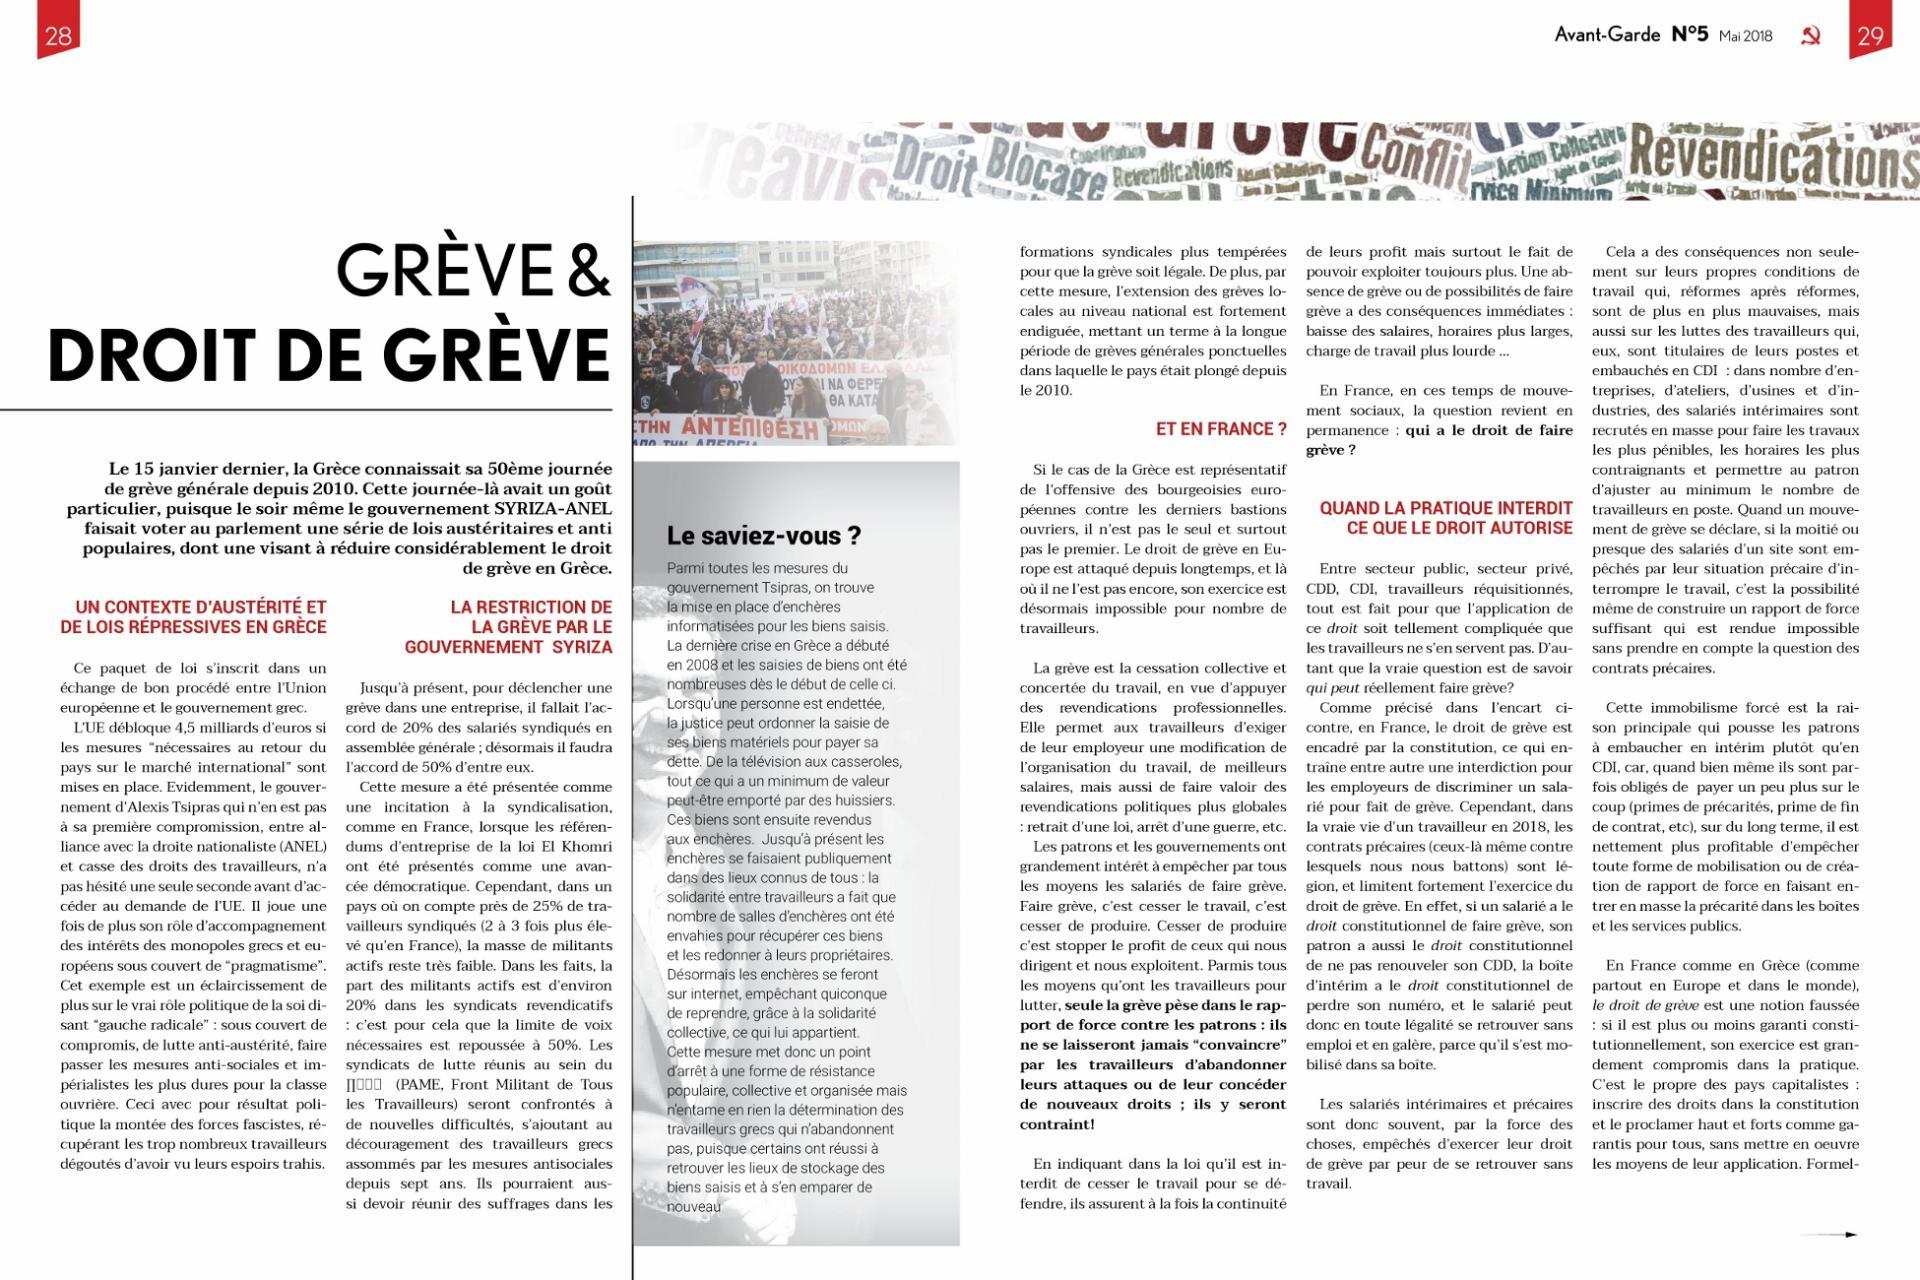 Avant-Garde Mai 2018 - 28